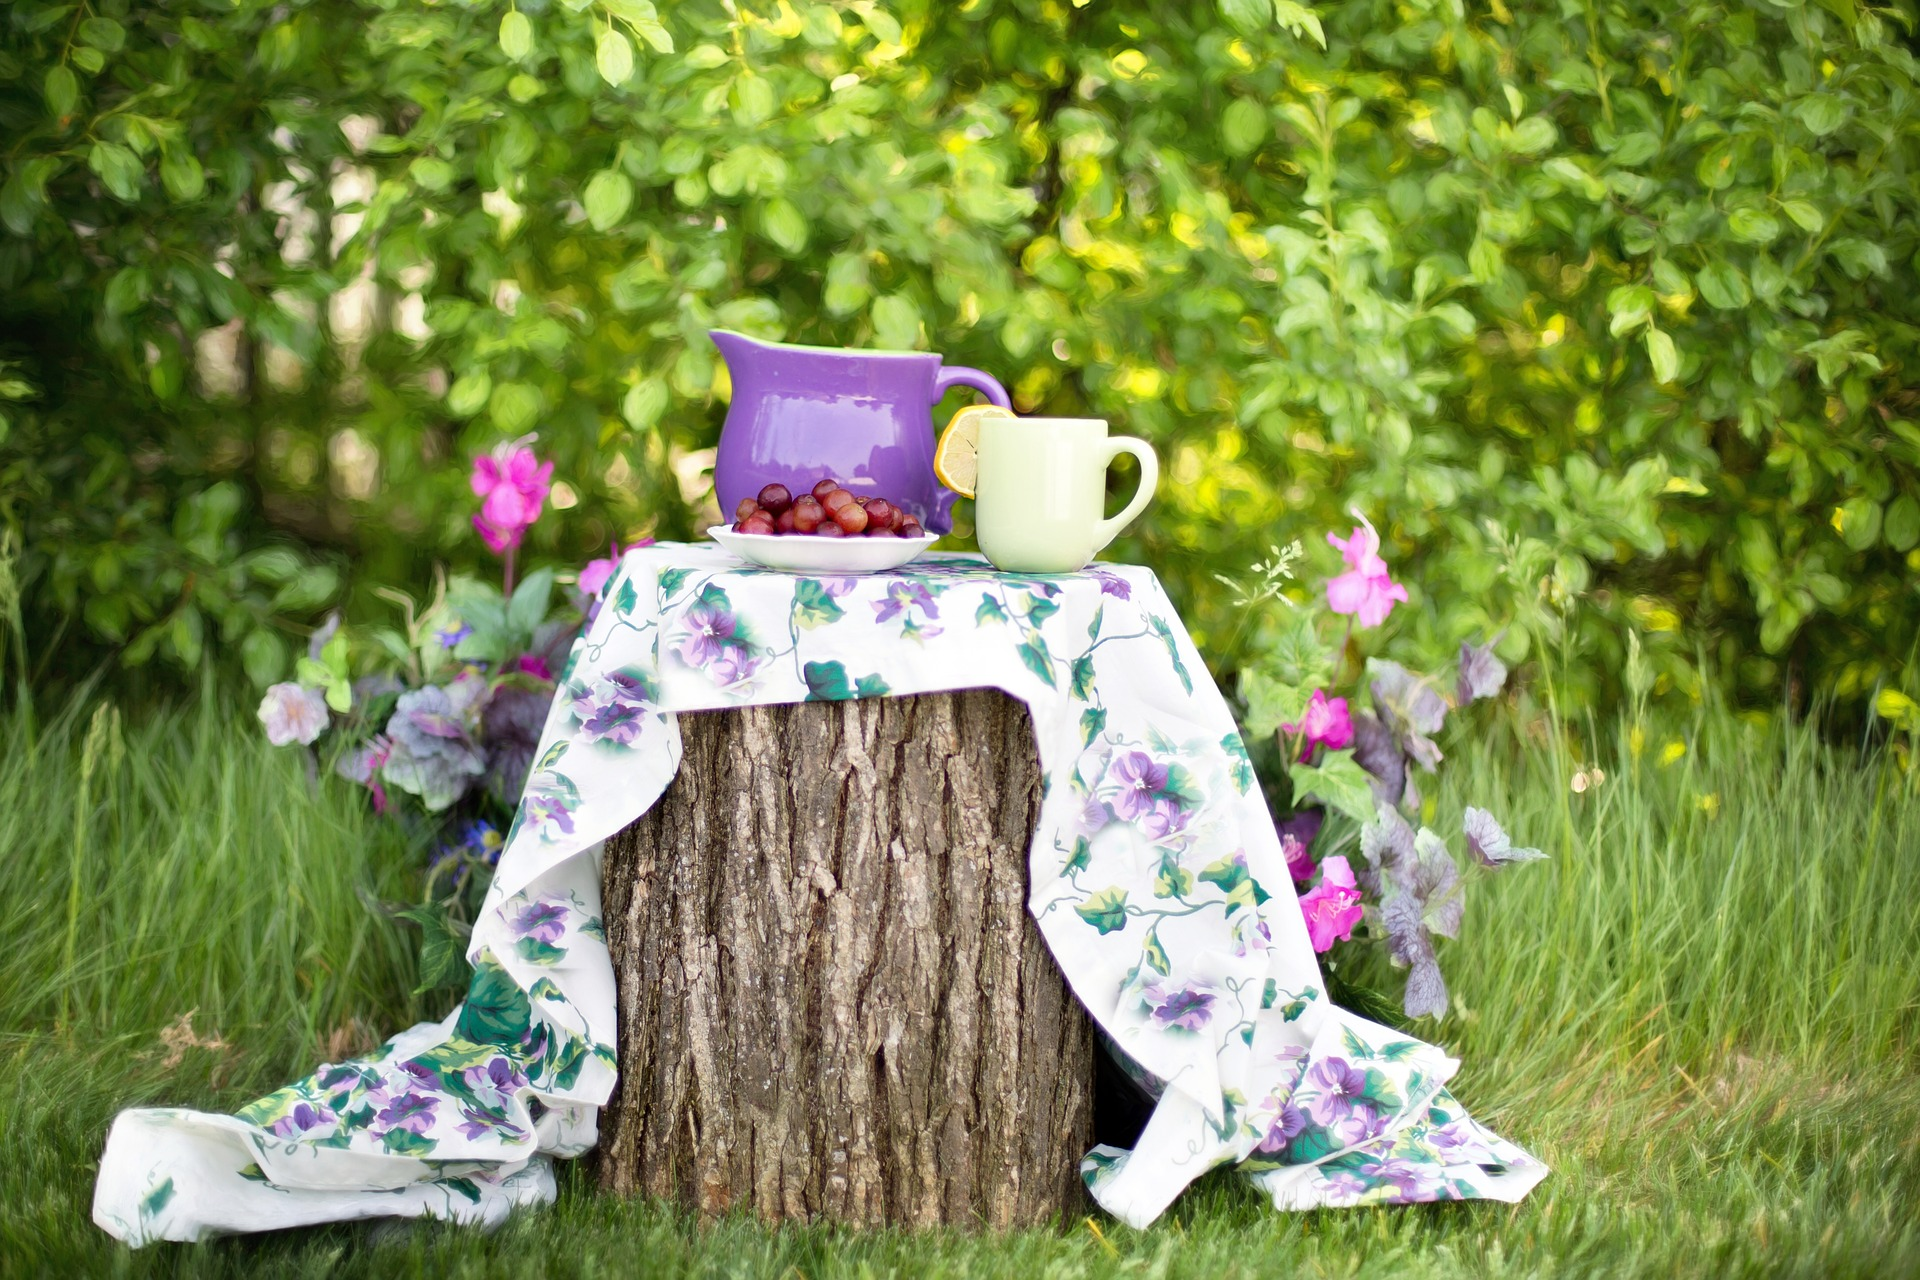 Benefits of Compost Tea